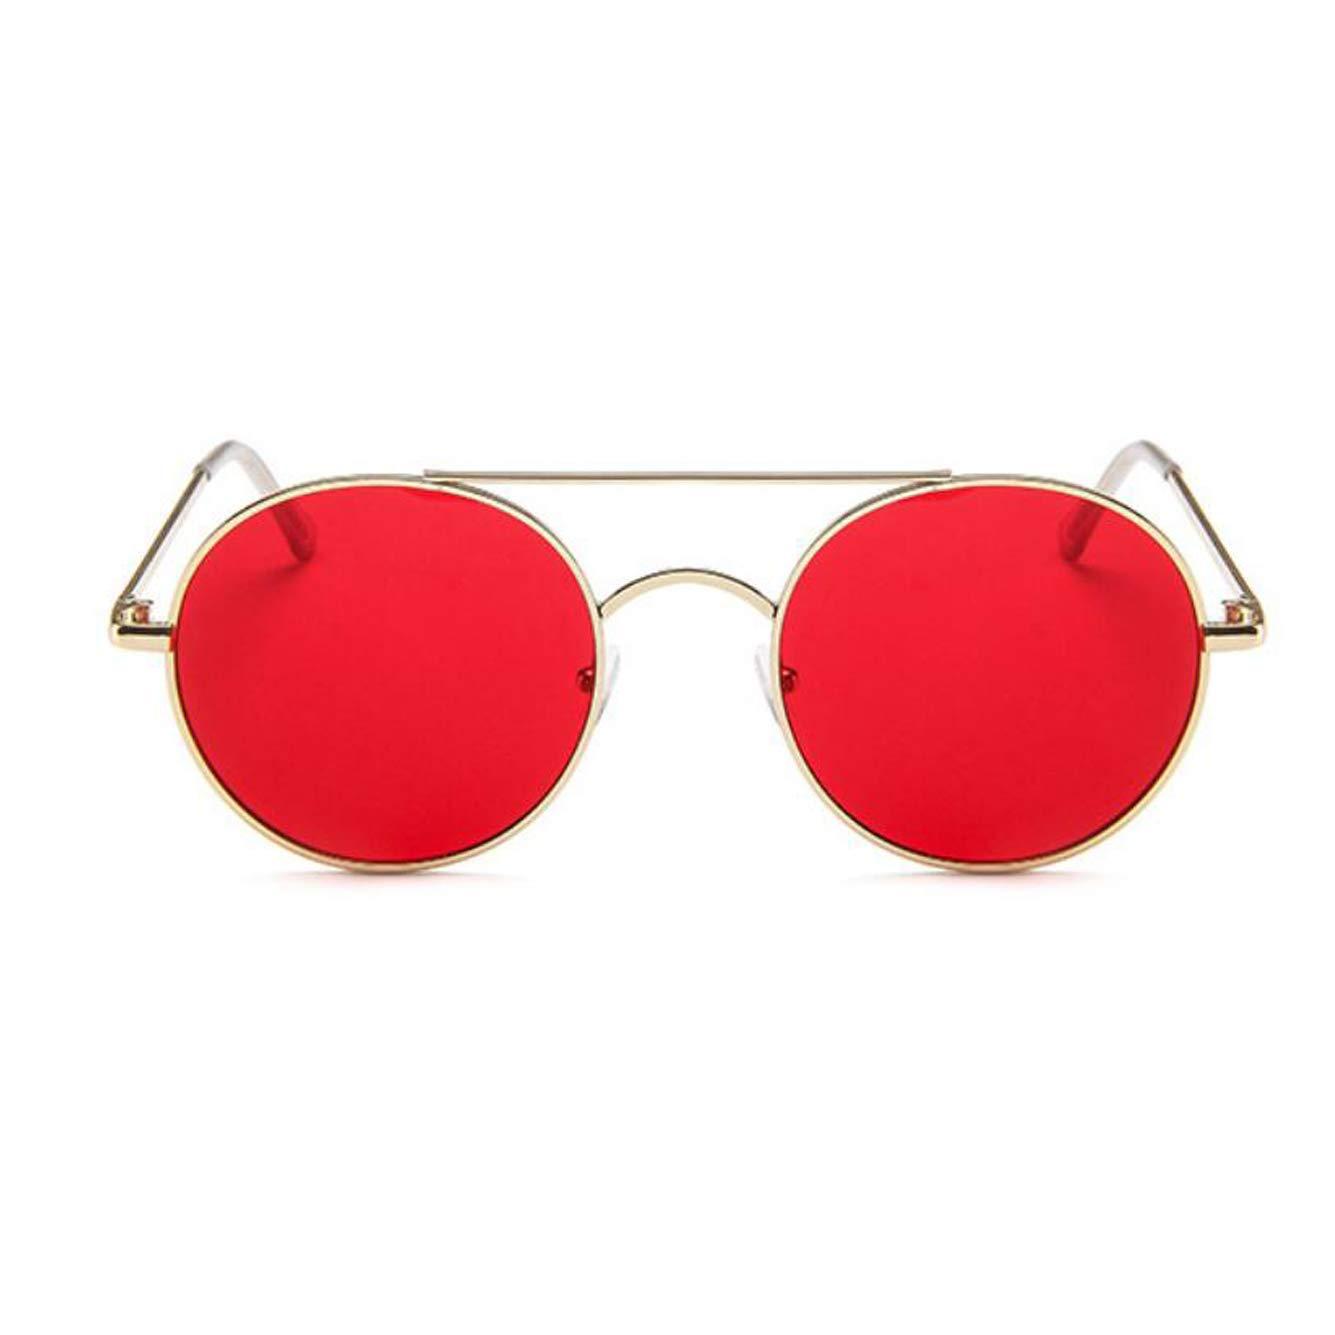 GAMT Round Sunglasses For Women Men Trend Metal Frame Ocean Piece Retro Double Beam Eyeglasses